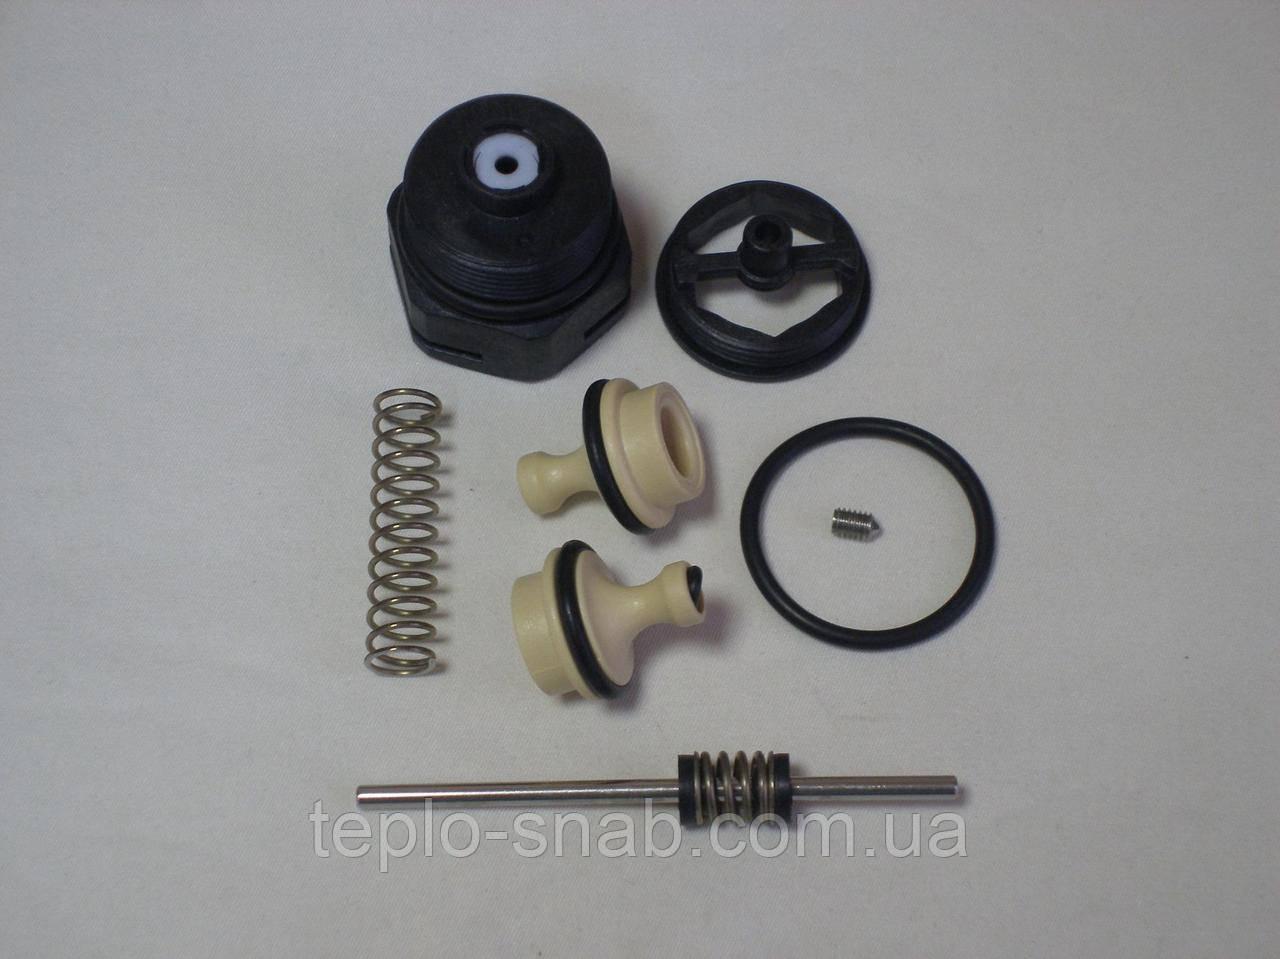 Ремкомплект 3-х ходового клапана Hermann Micra - 2 new. H010006037